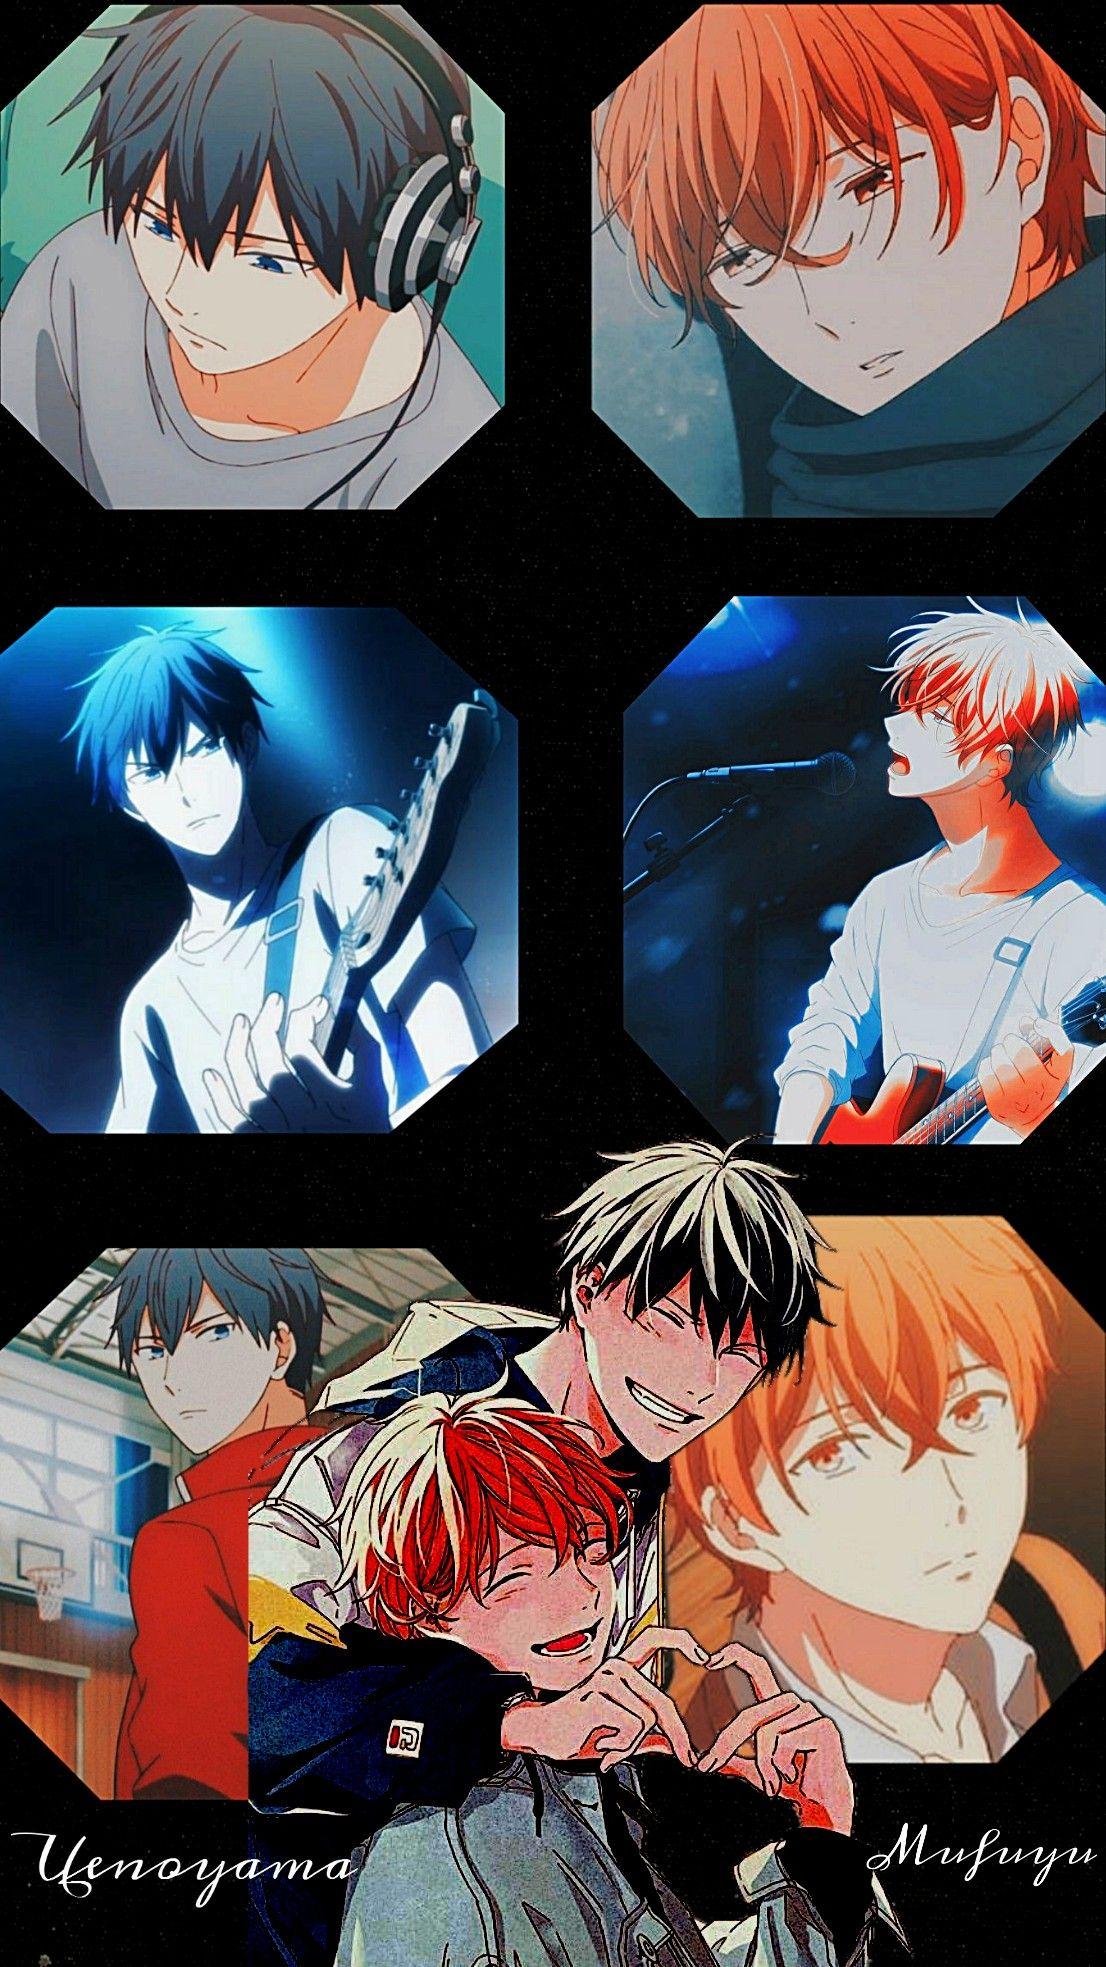 Mufuyu X Uenoyama In 2020 Anime Anime Wallpaper Art